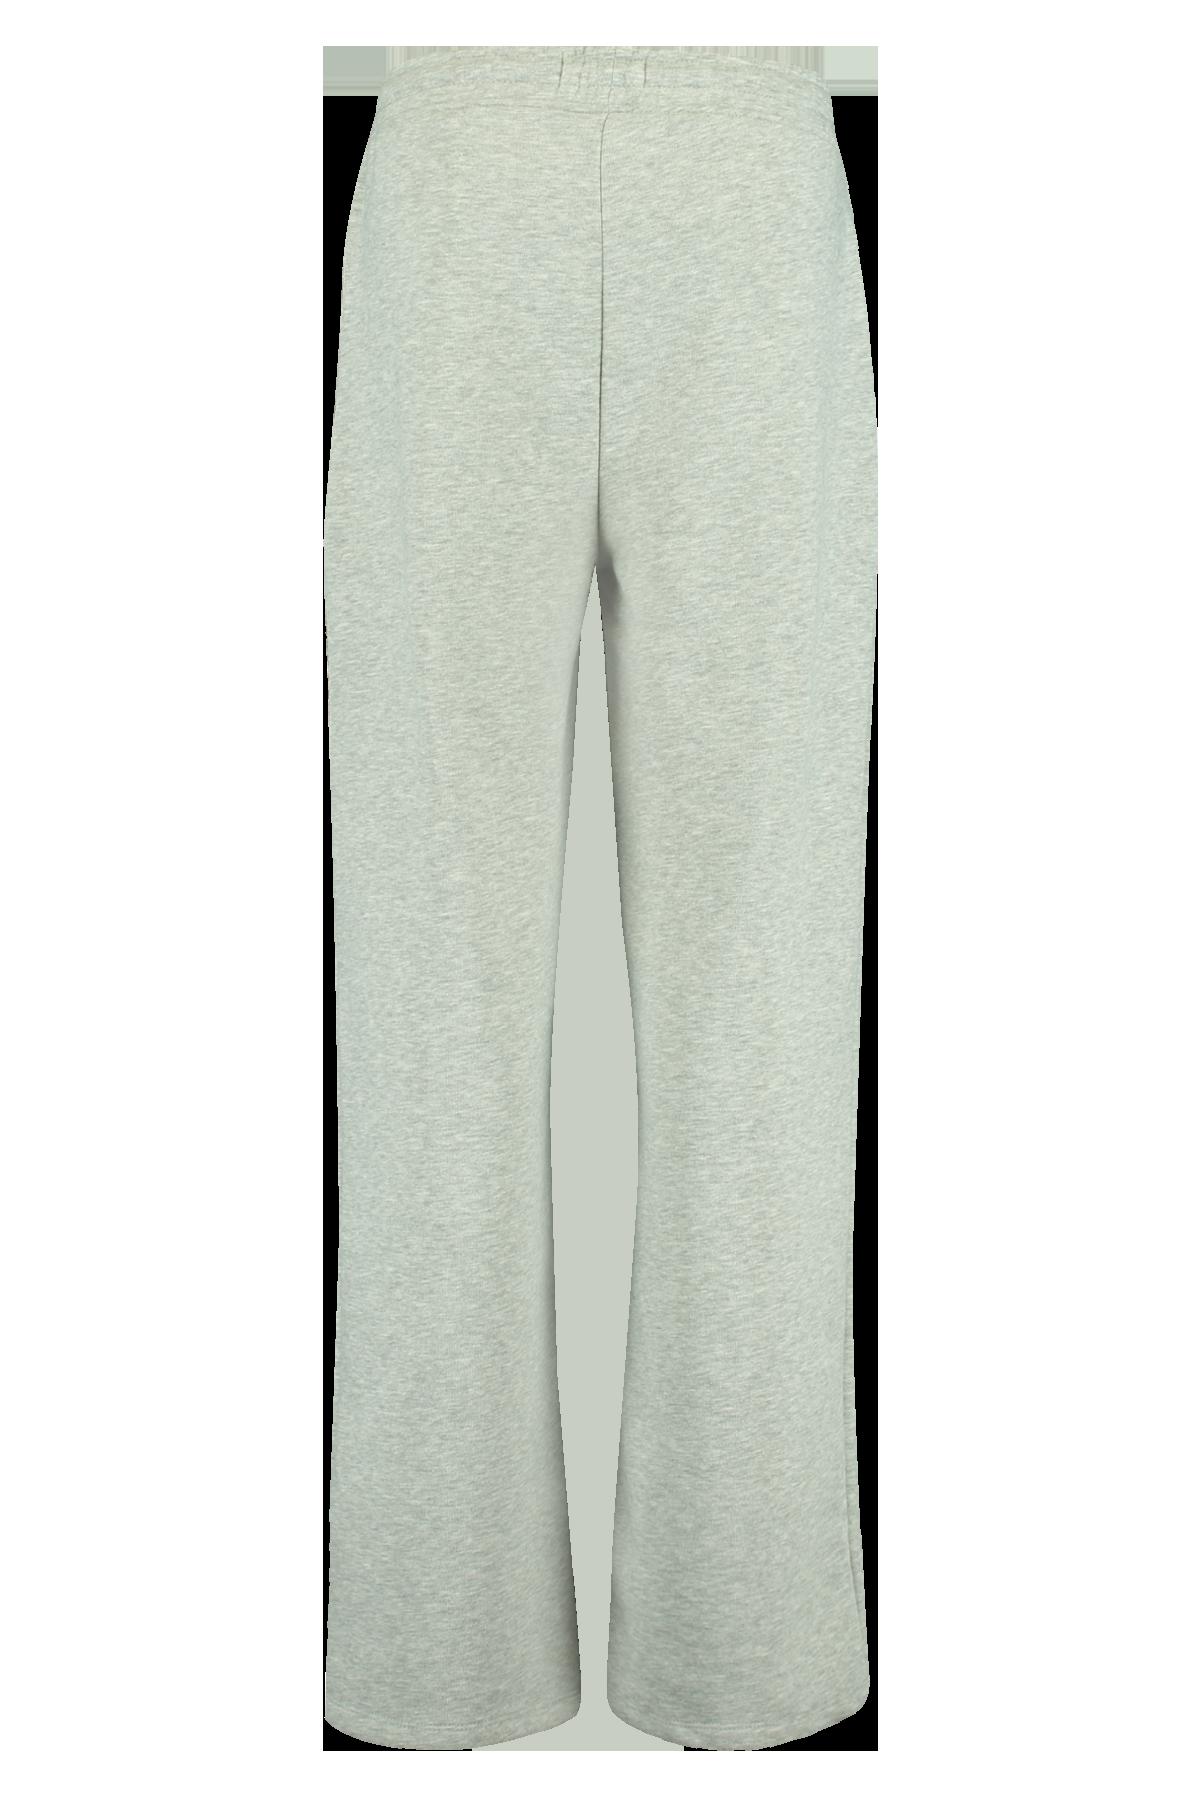 Pantalon de jogging Casey